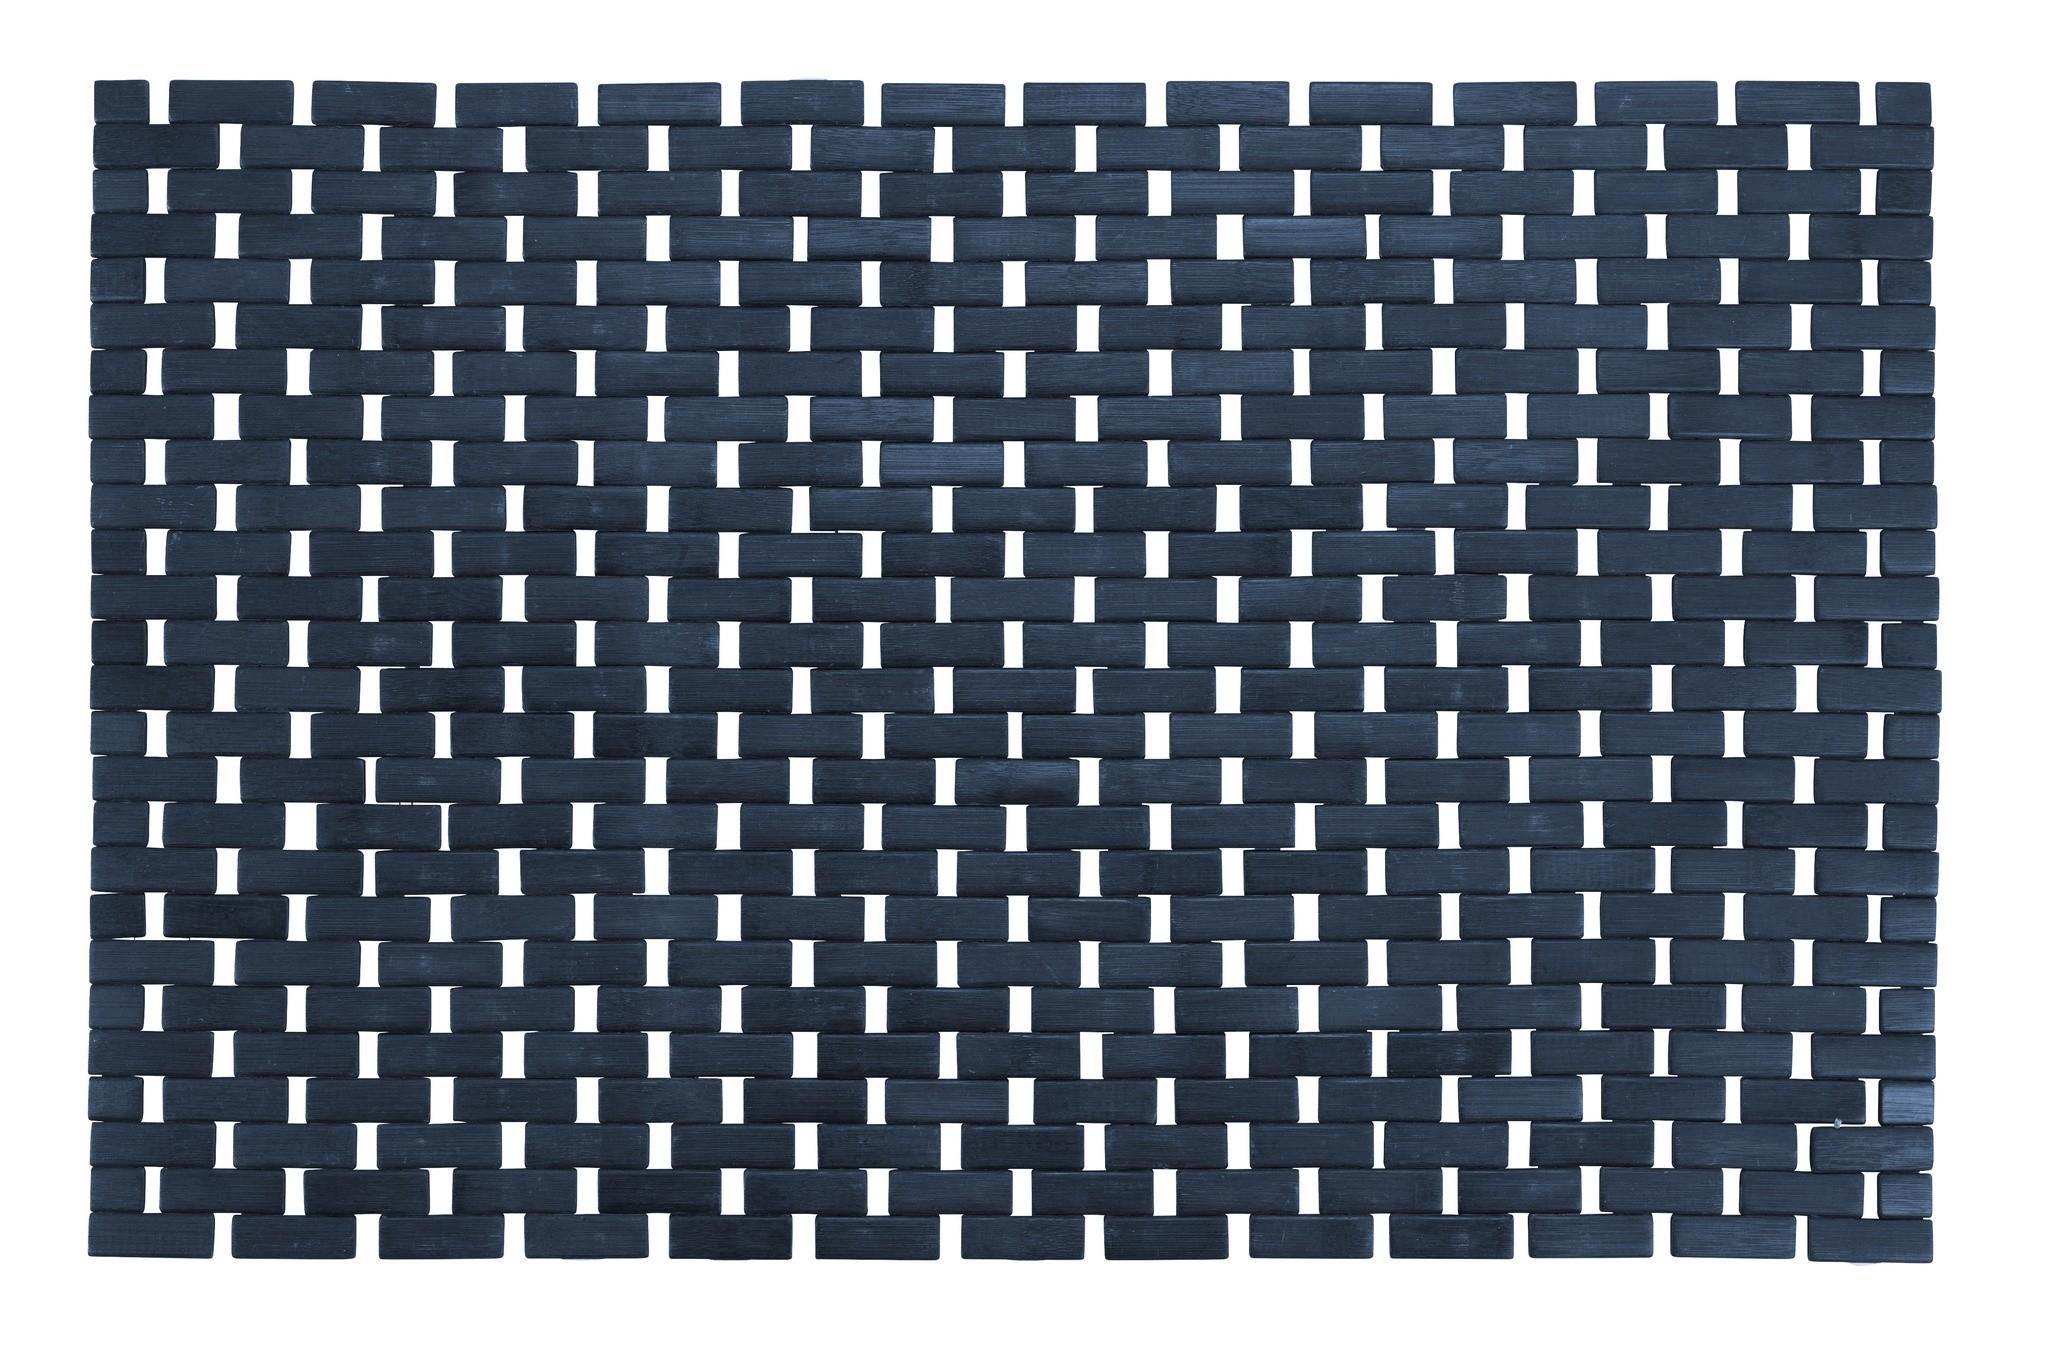 Wenko Badematte Bamboo Dunkelblau, 50 x 80 cm